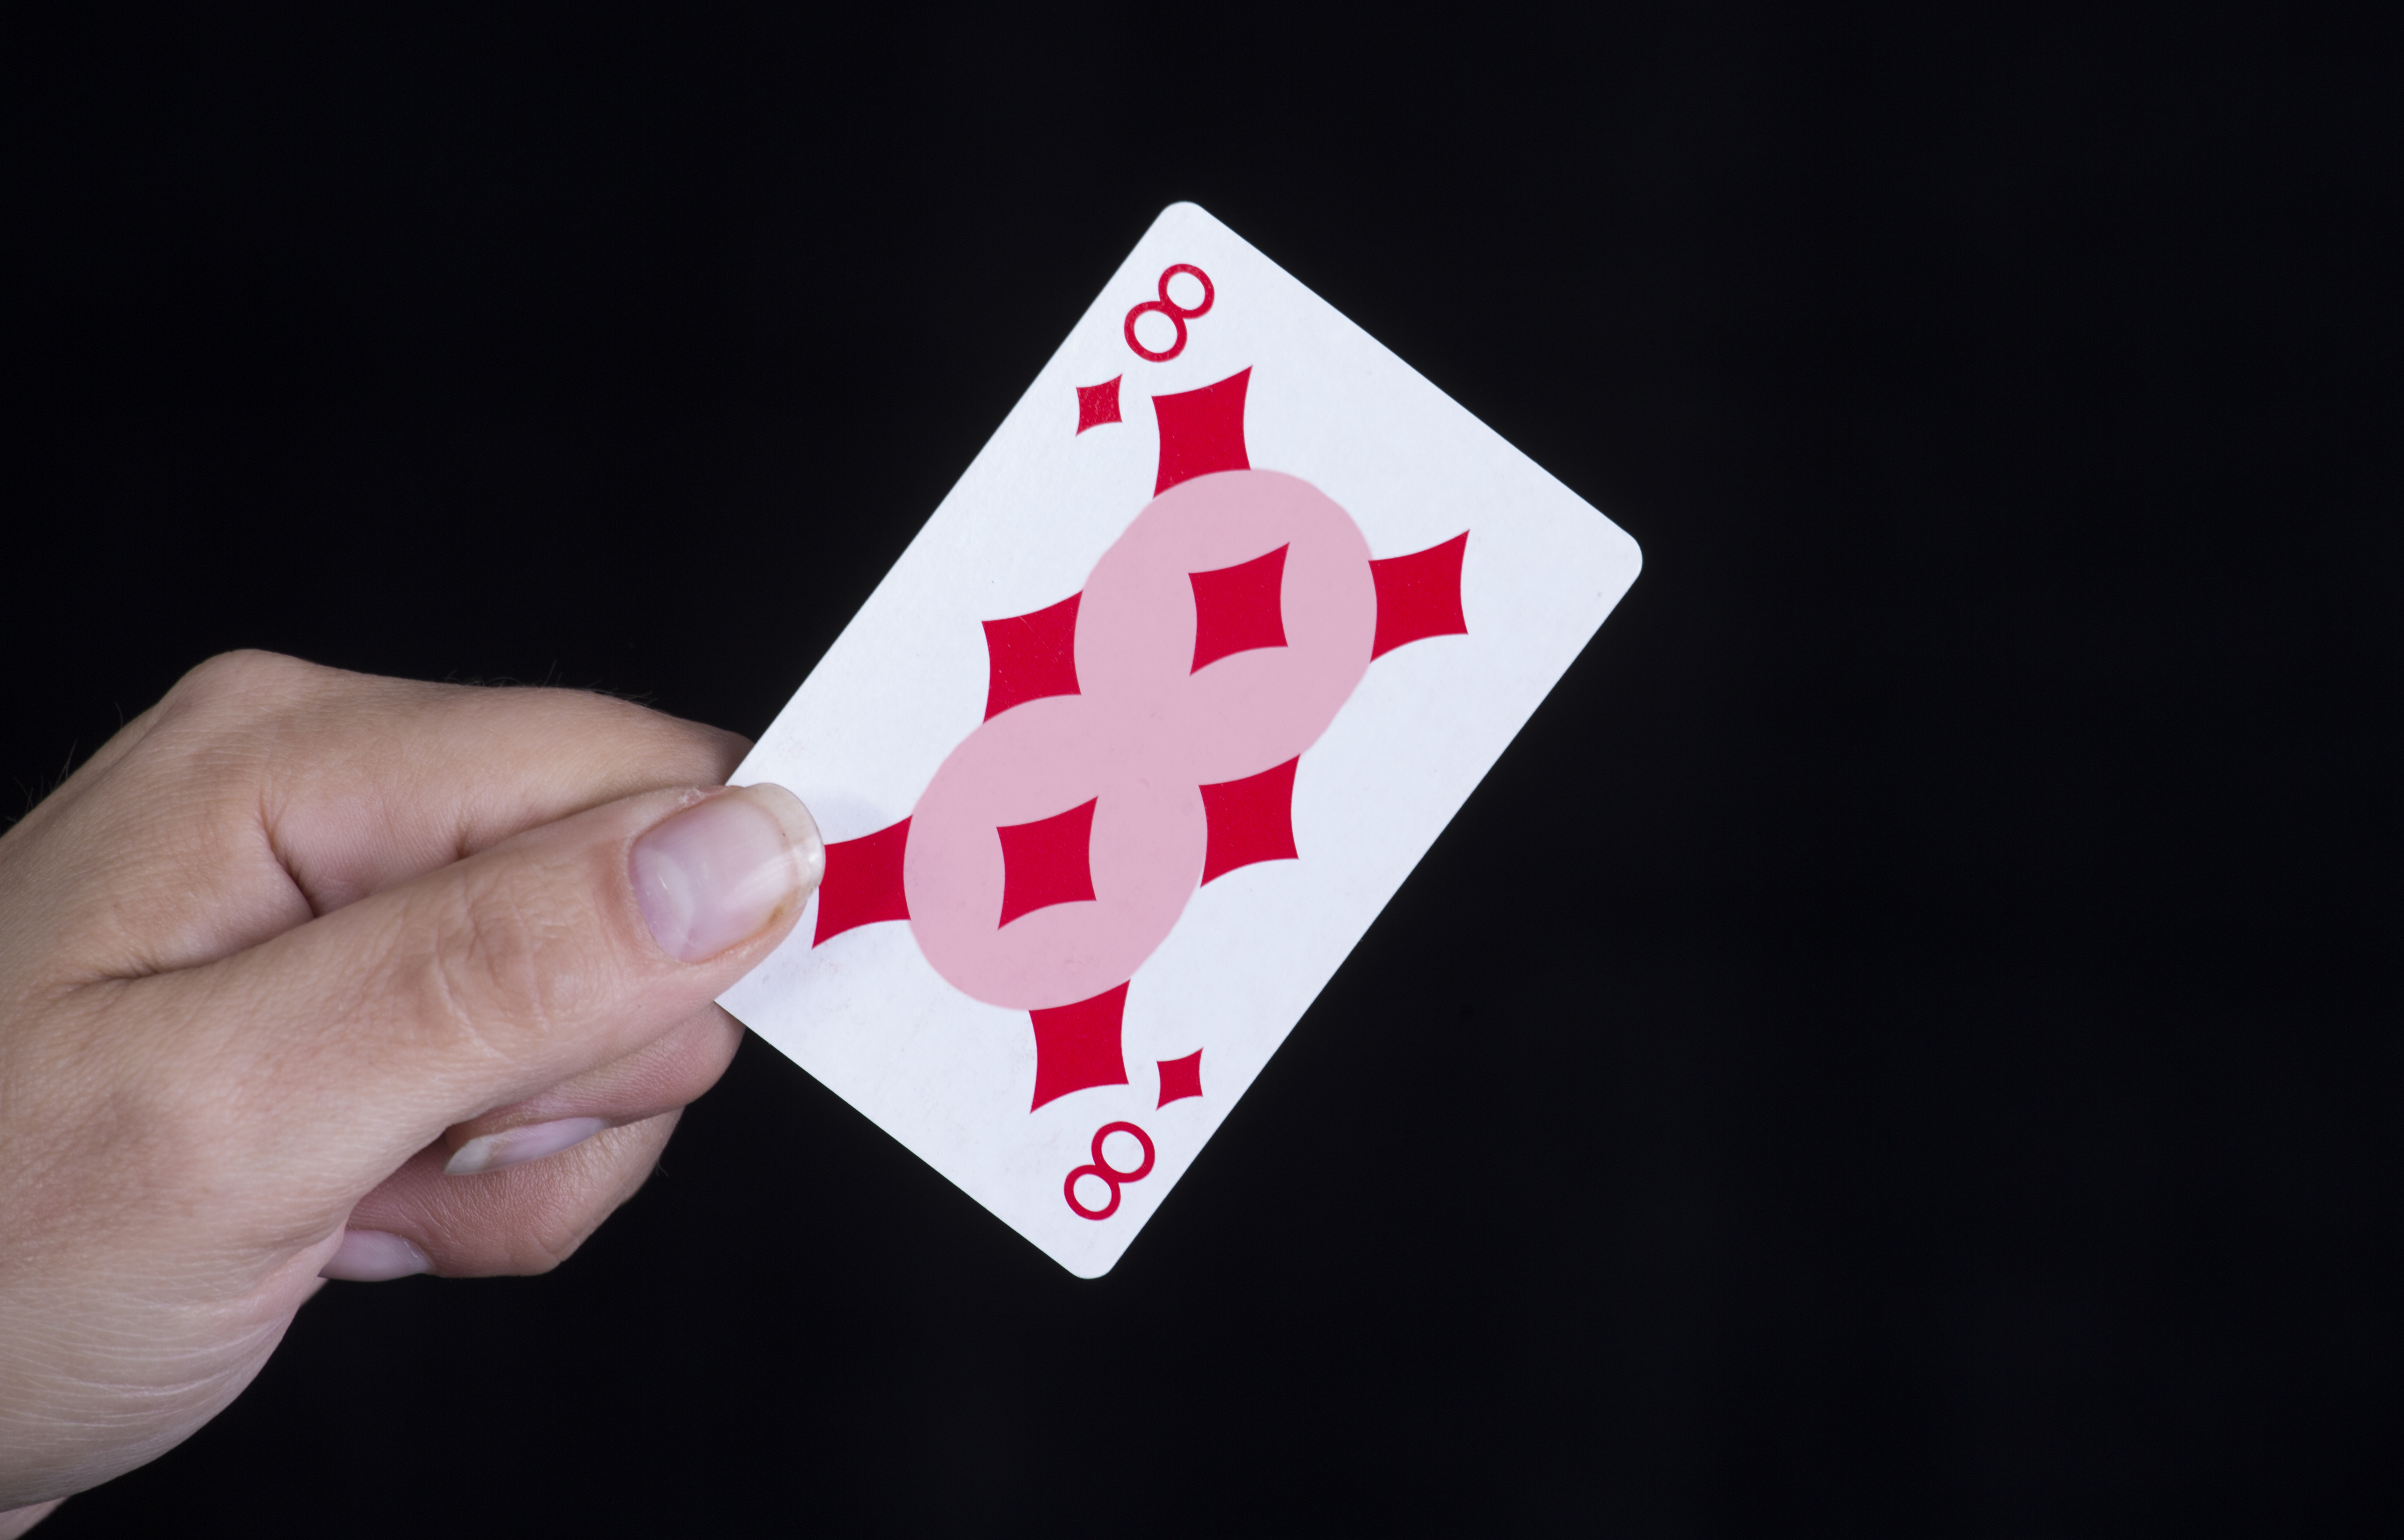 Highlighted figure 8 on 8 of diamonds card